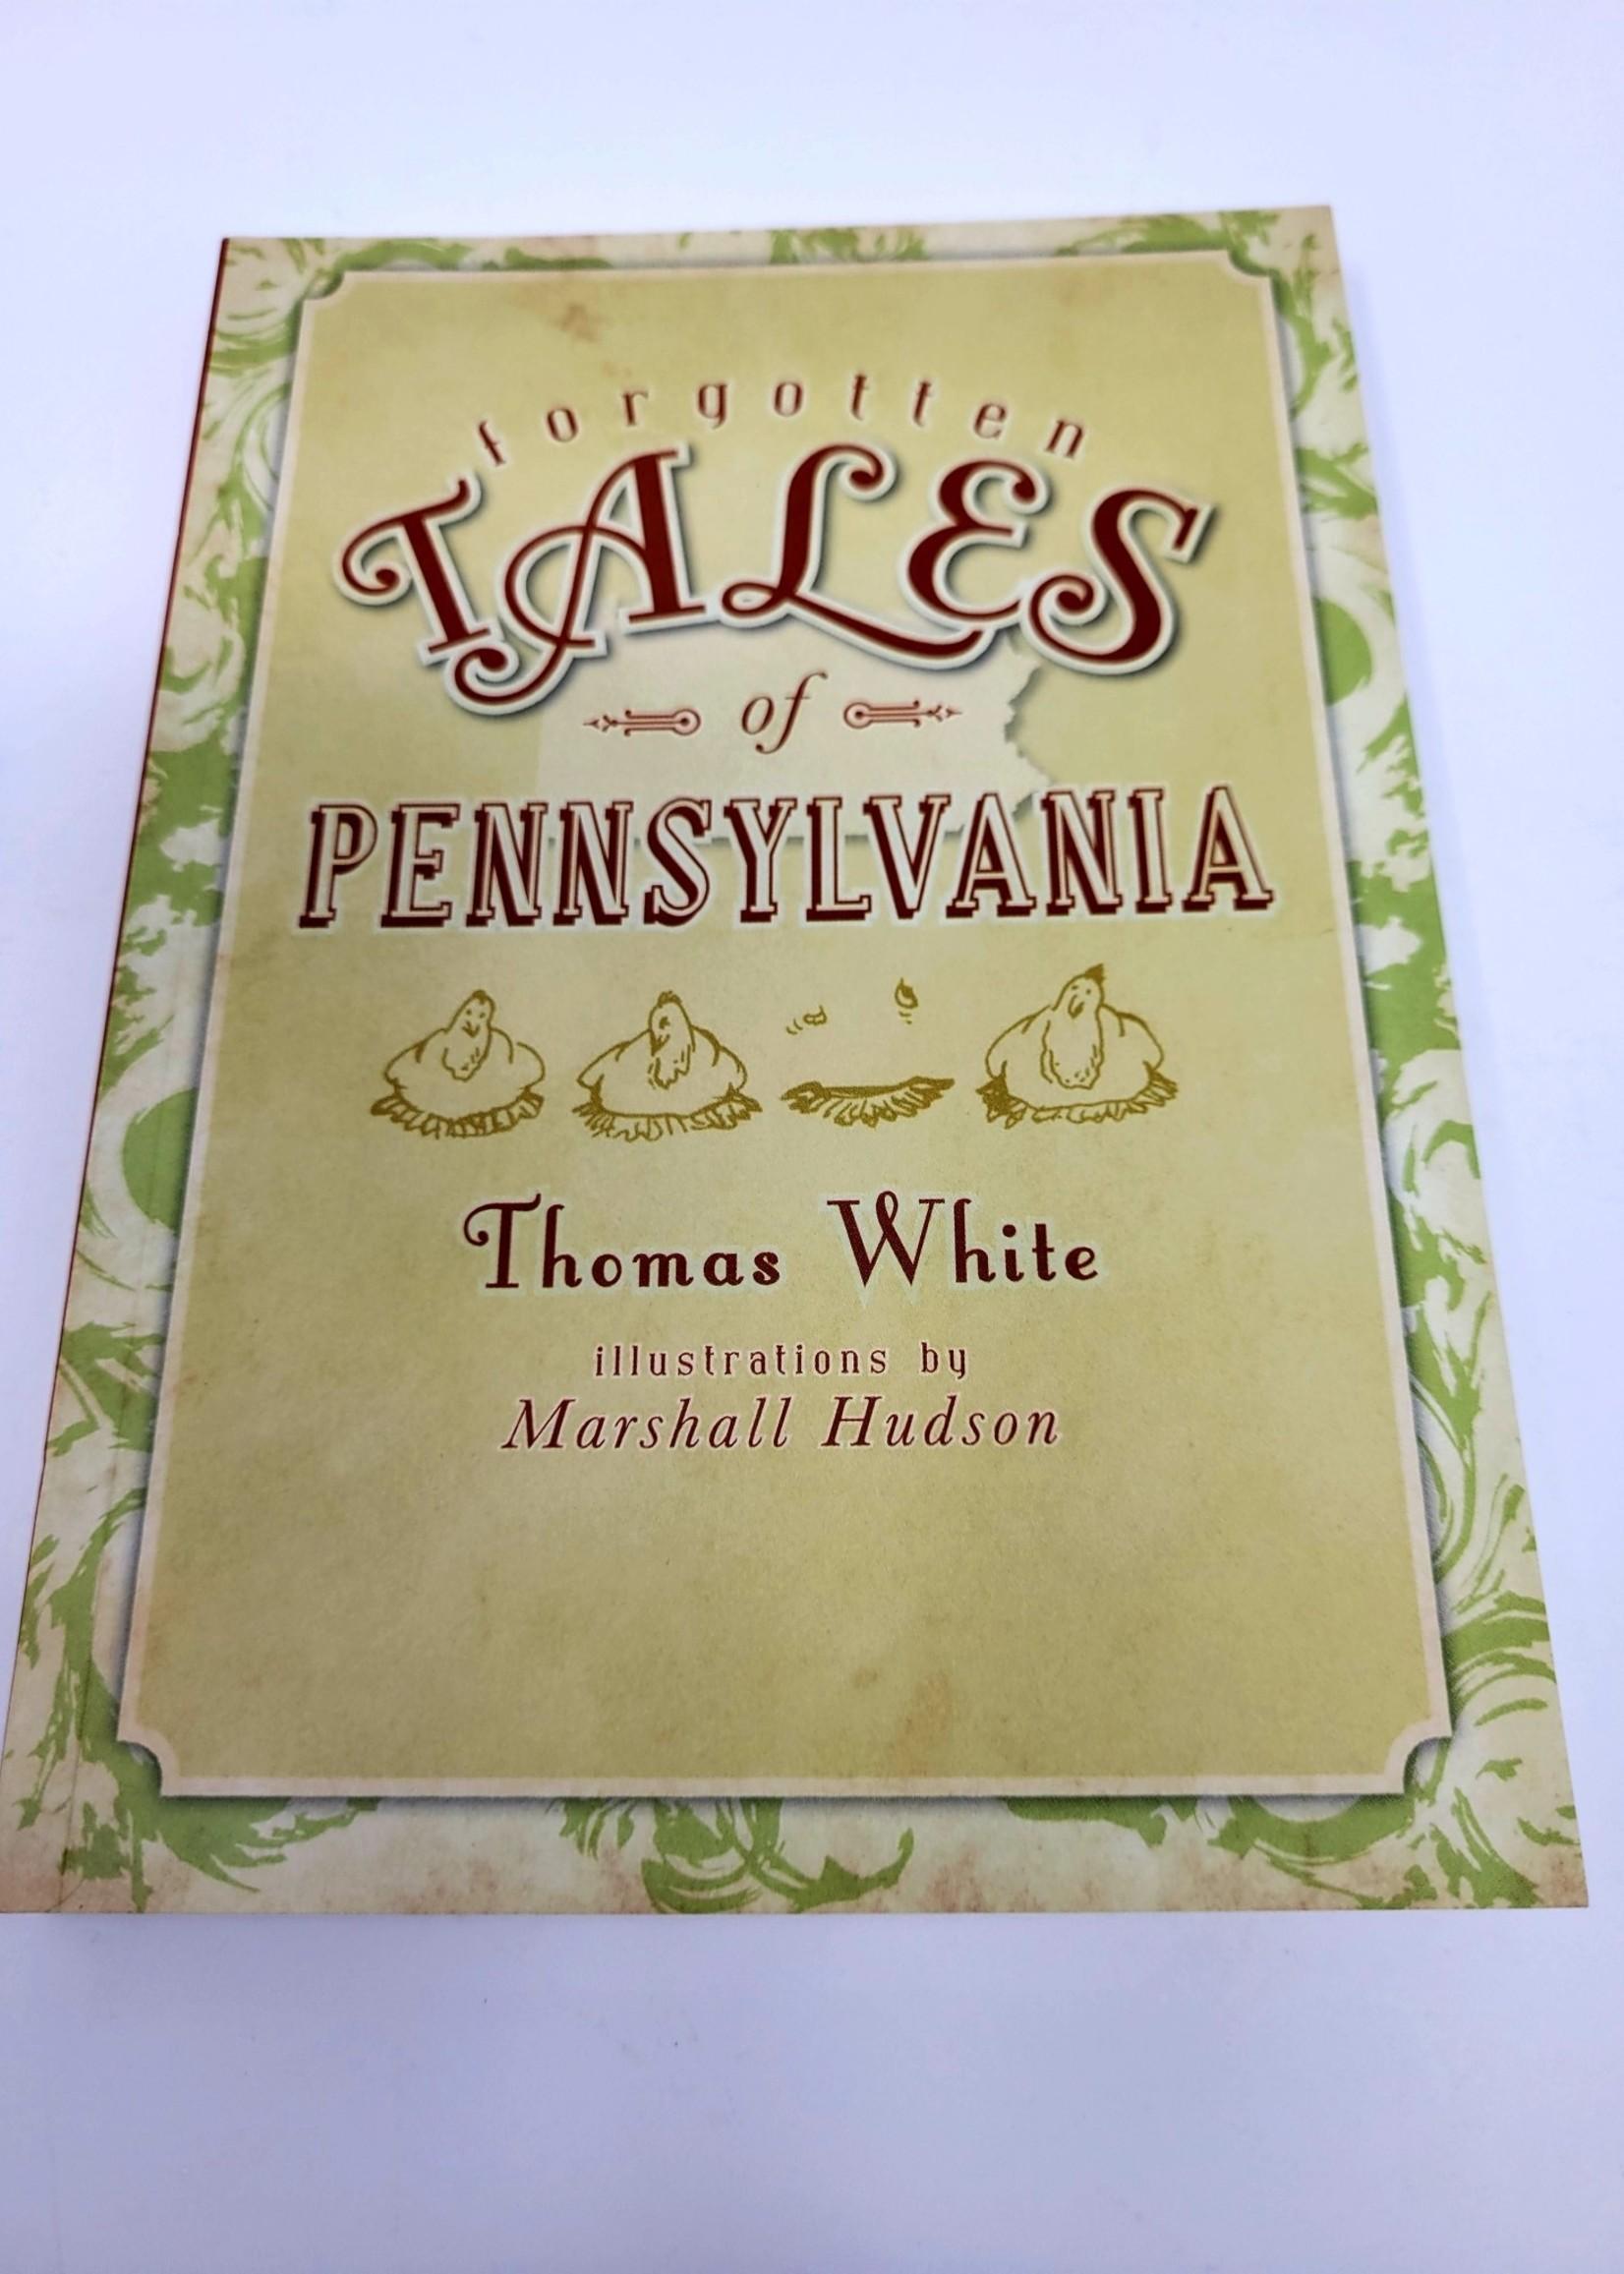 Forgotten Tales of Pennsylvania - By Thomas White, Illustrations by Marshall Hudson